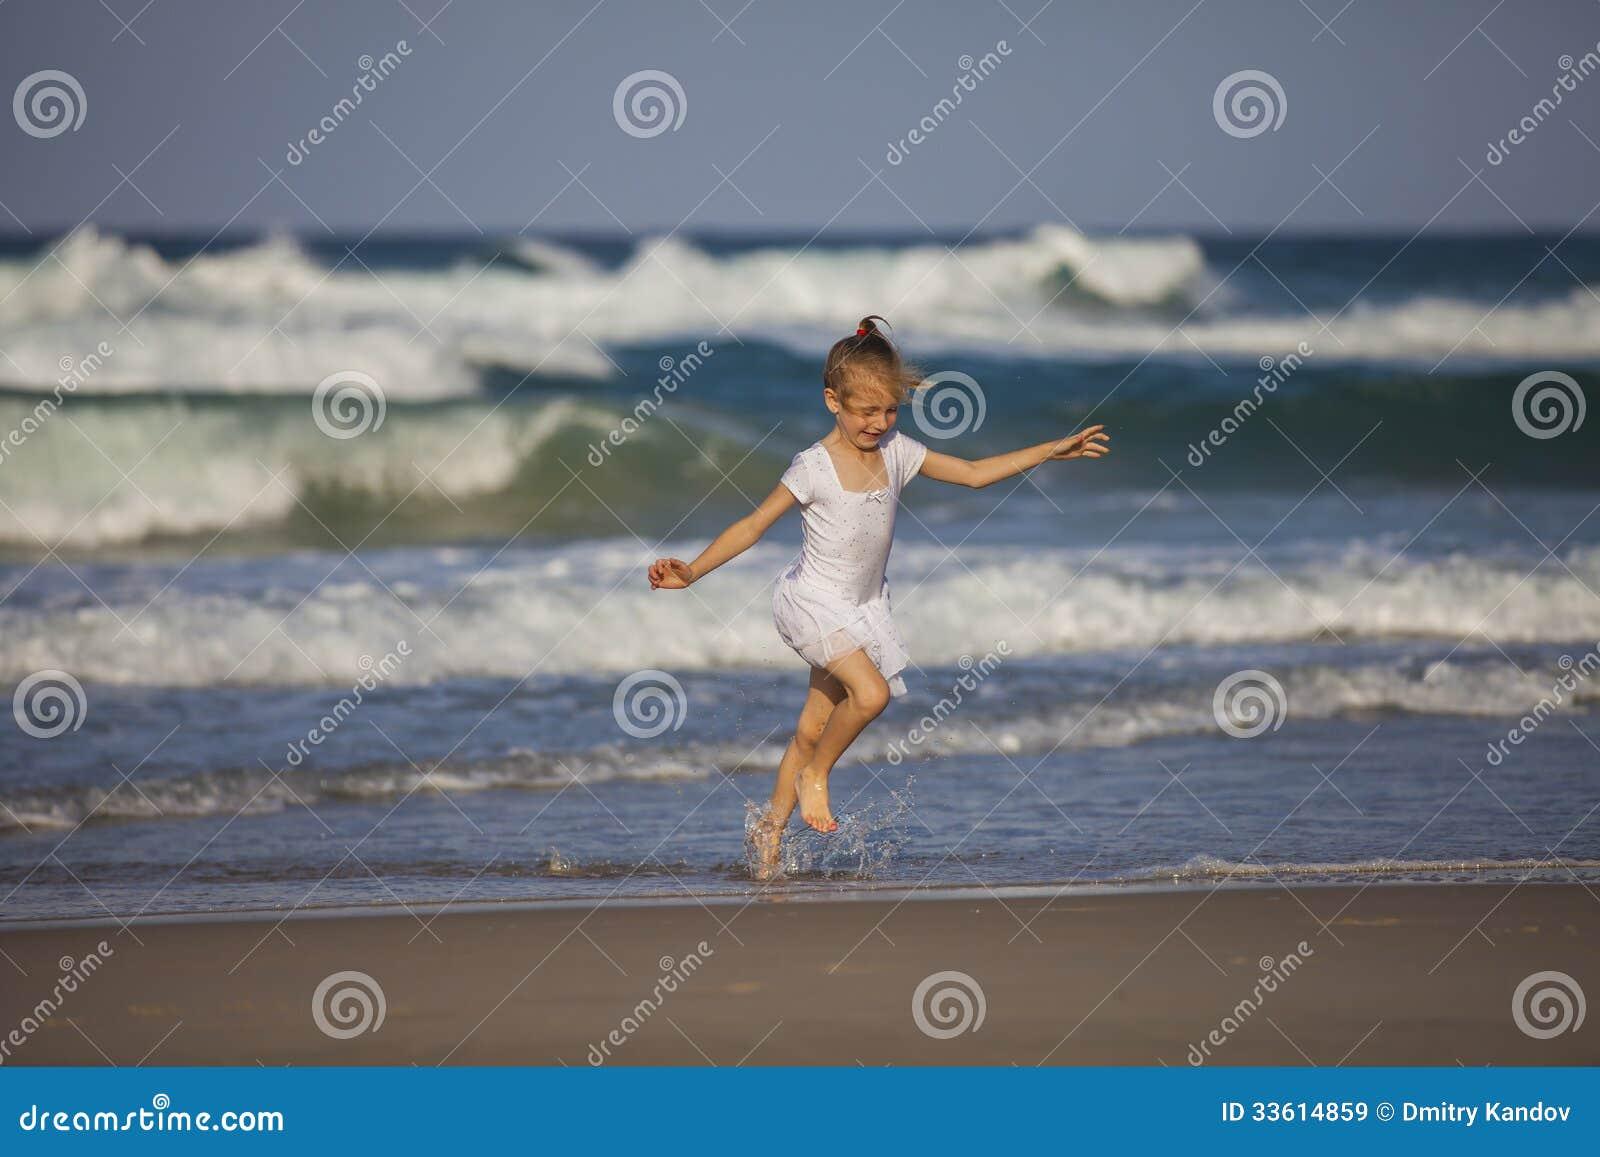 Girl Running On The Beach Royalty Free Stock Images ... Girl Running On Beach